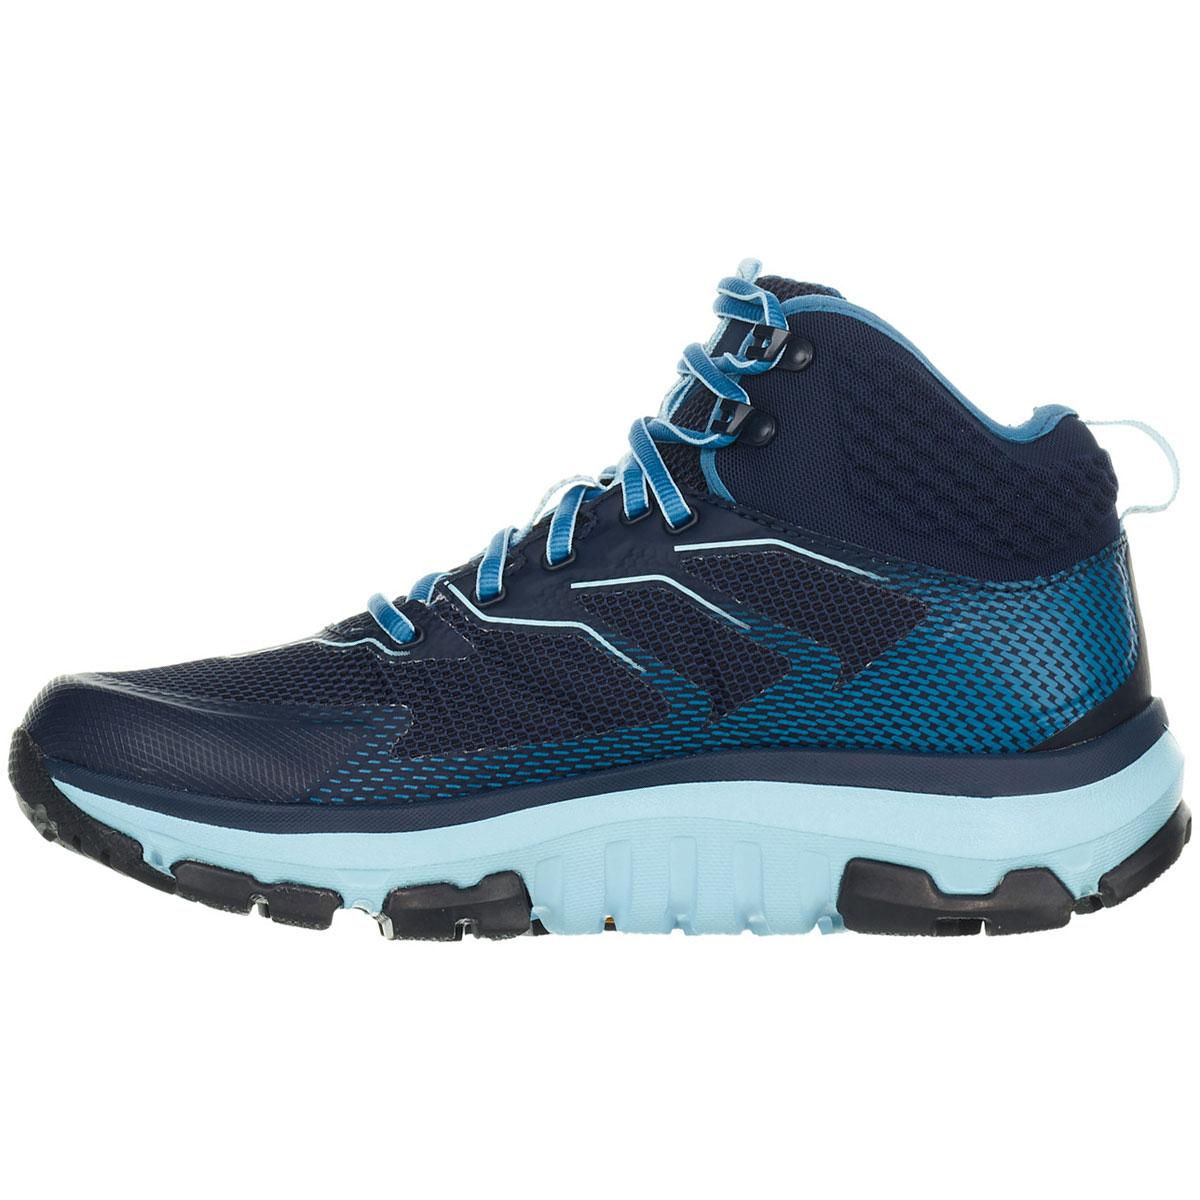 Women's Hoka One One Sky Toa Gore-Tex Trail Running Shoe - Color: Black Iris/Aquamarine - Size: 5 - Width: Regular, Black Iris/Aquamarine, large, image 4